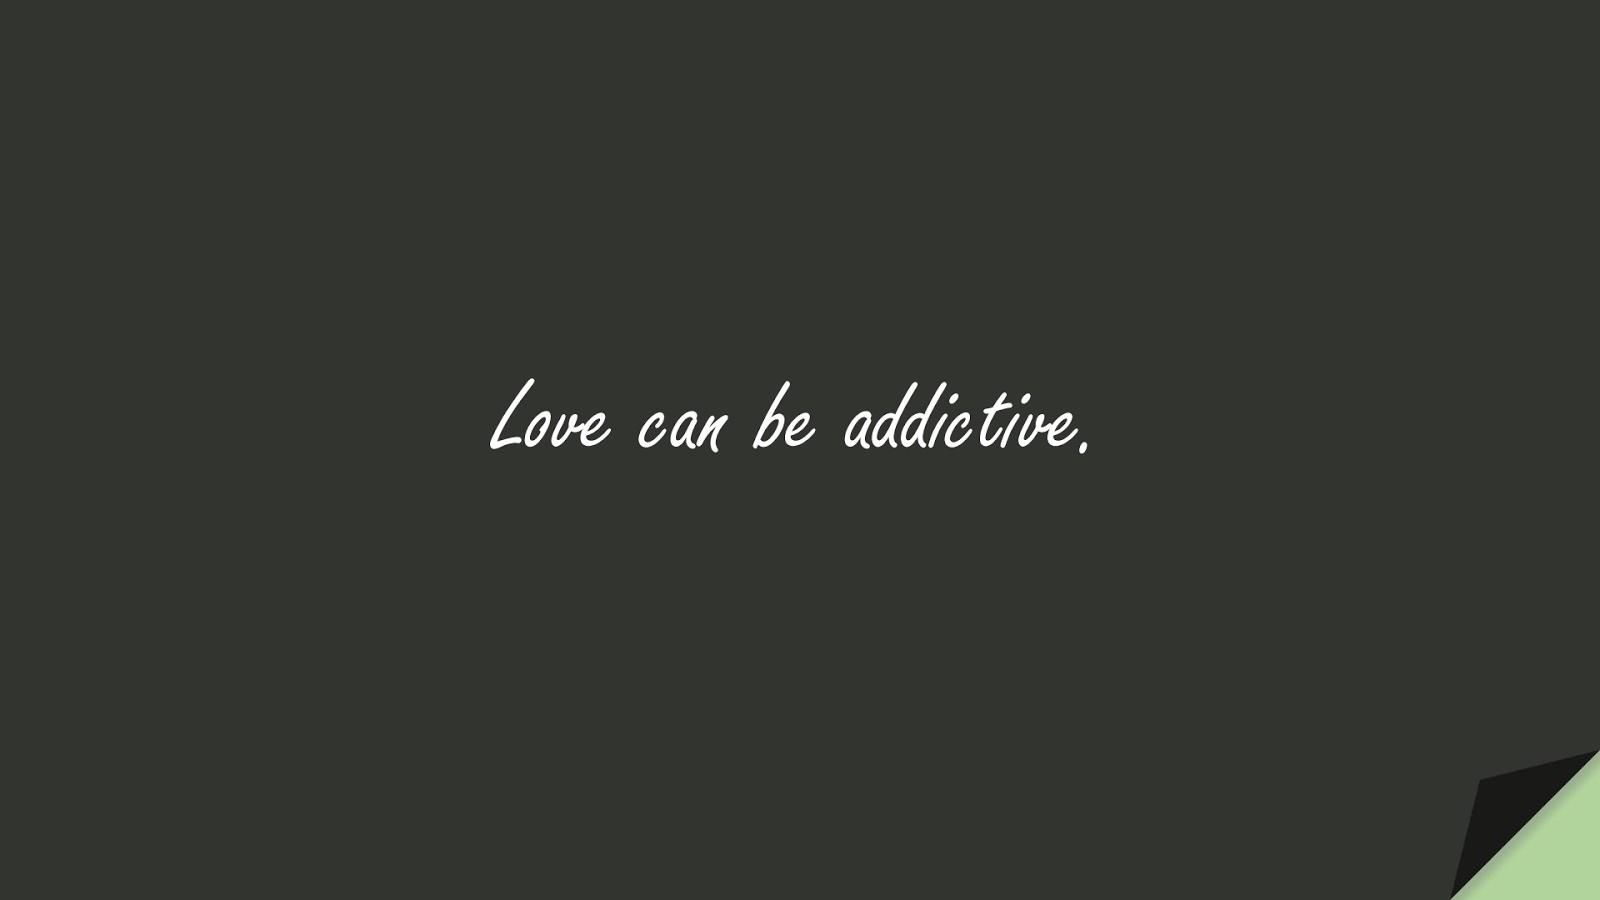 Love can be addictive.FALSE